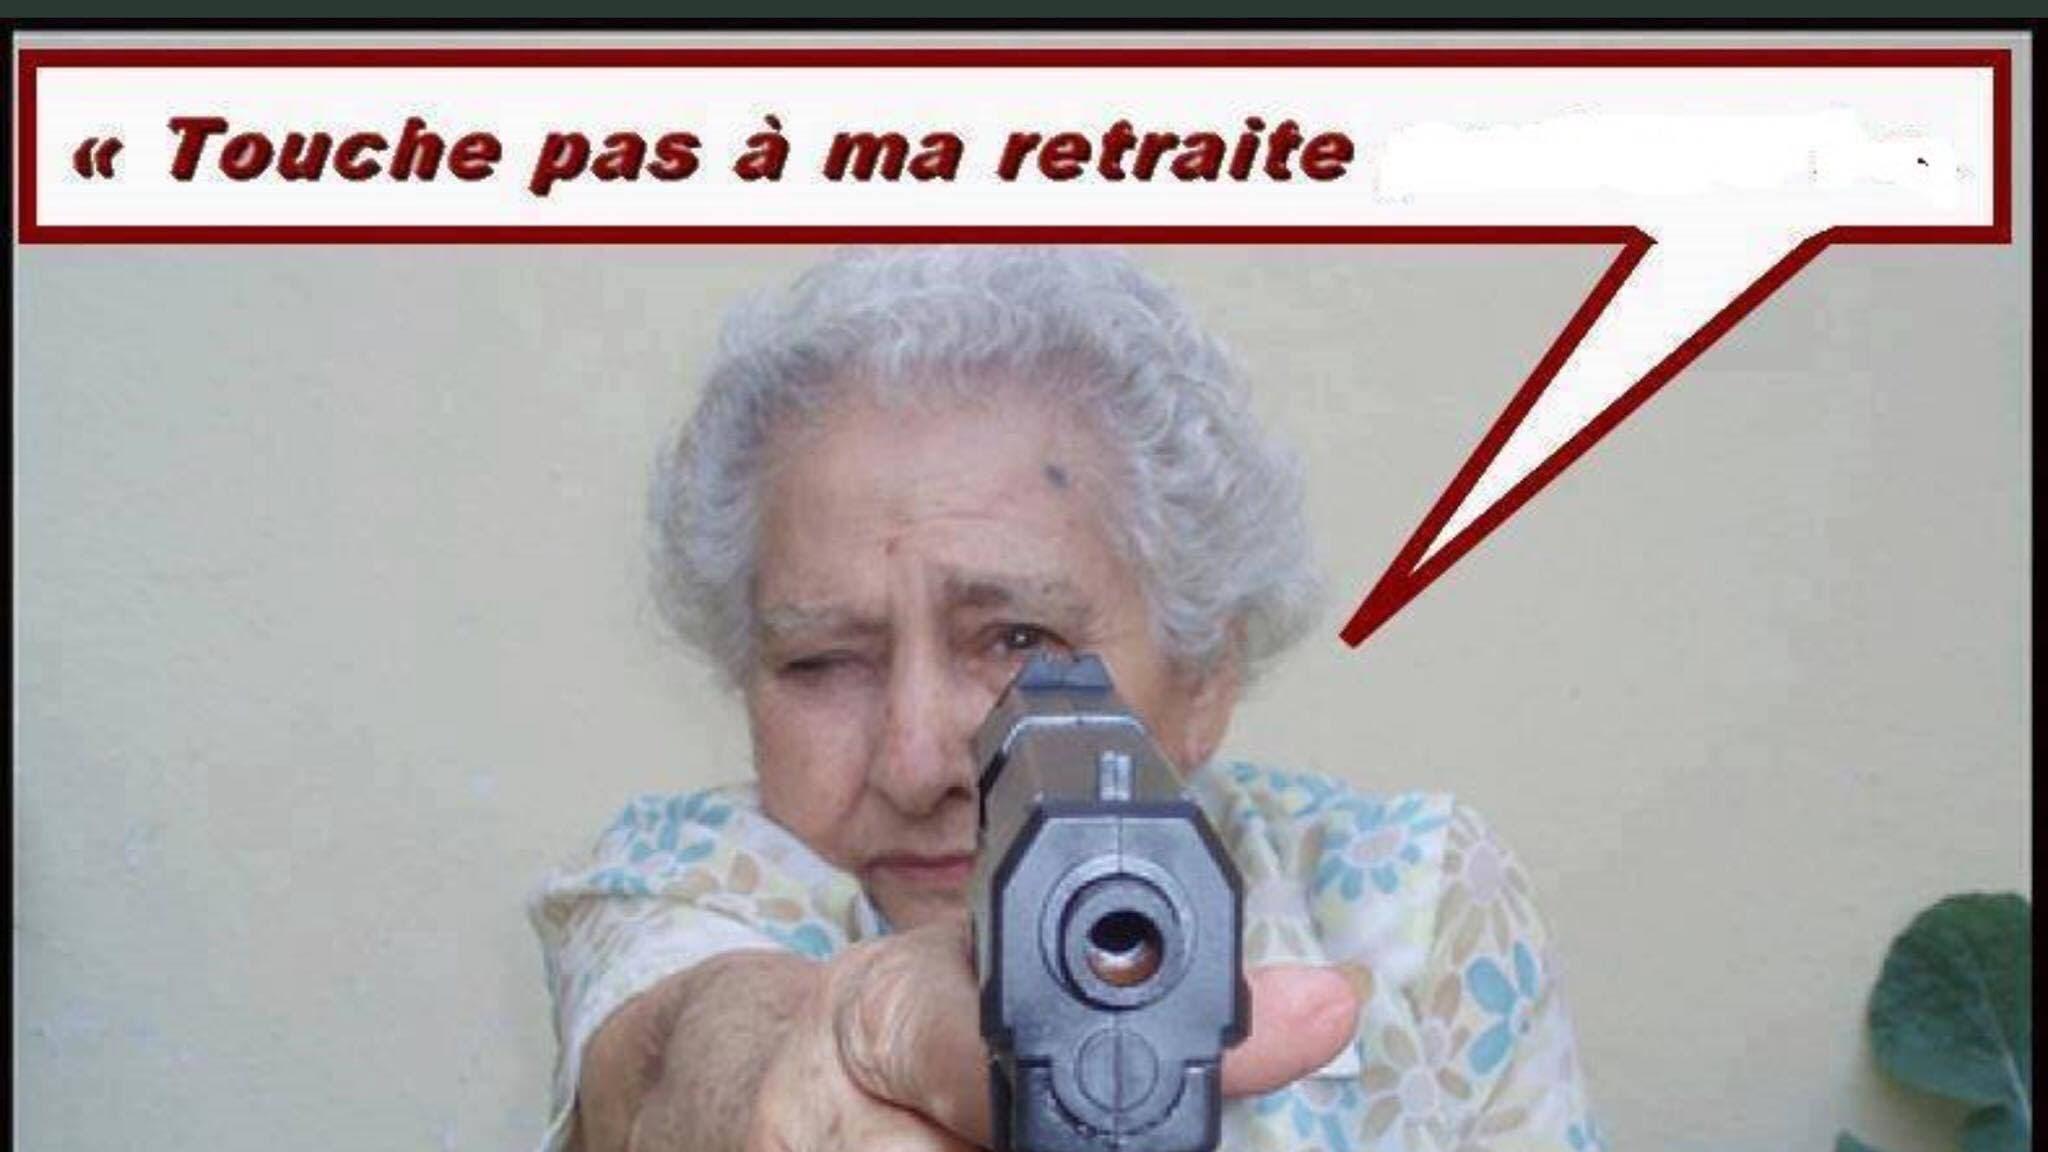 touche-pas-ma-retraite